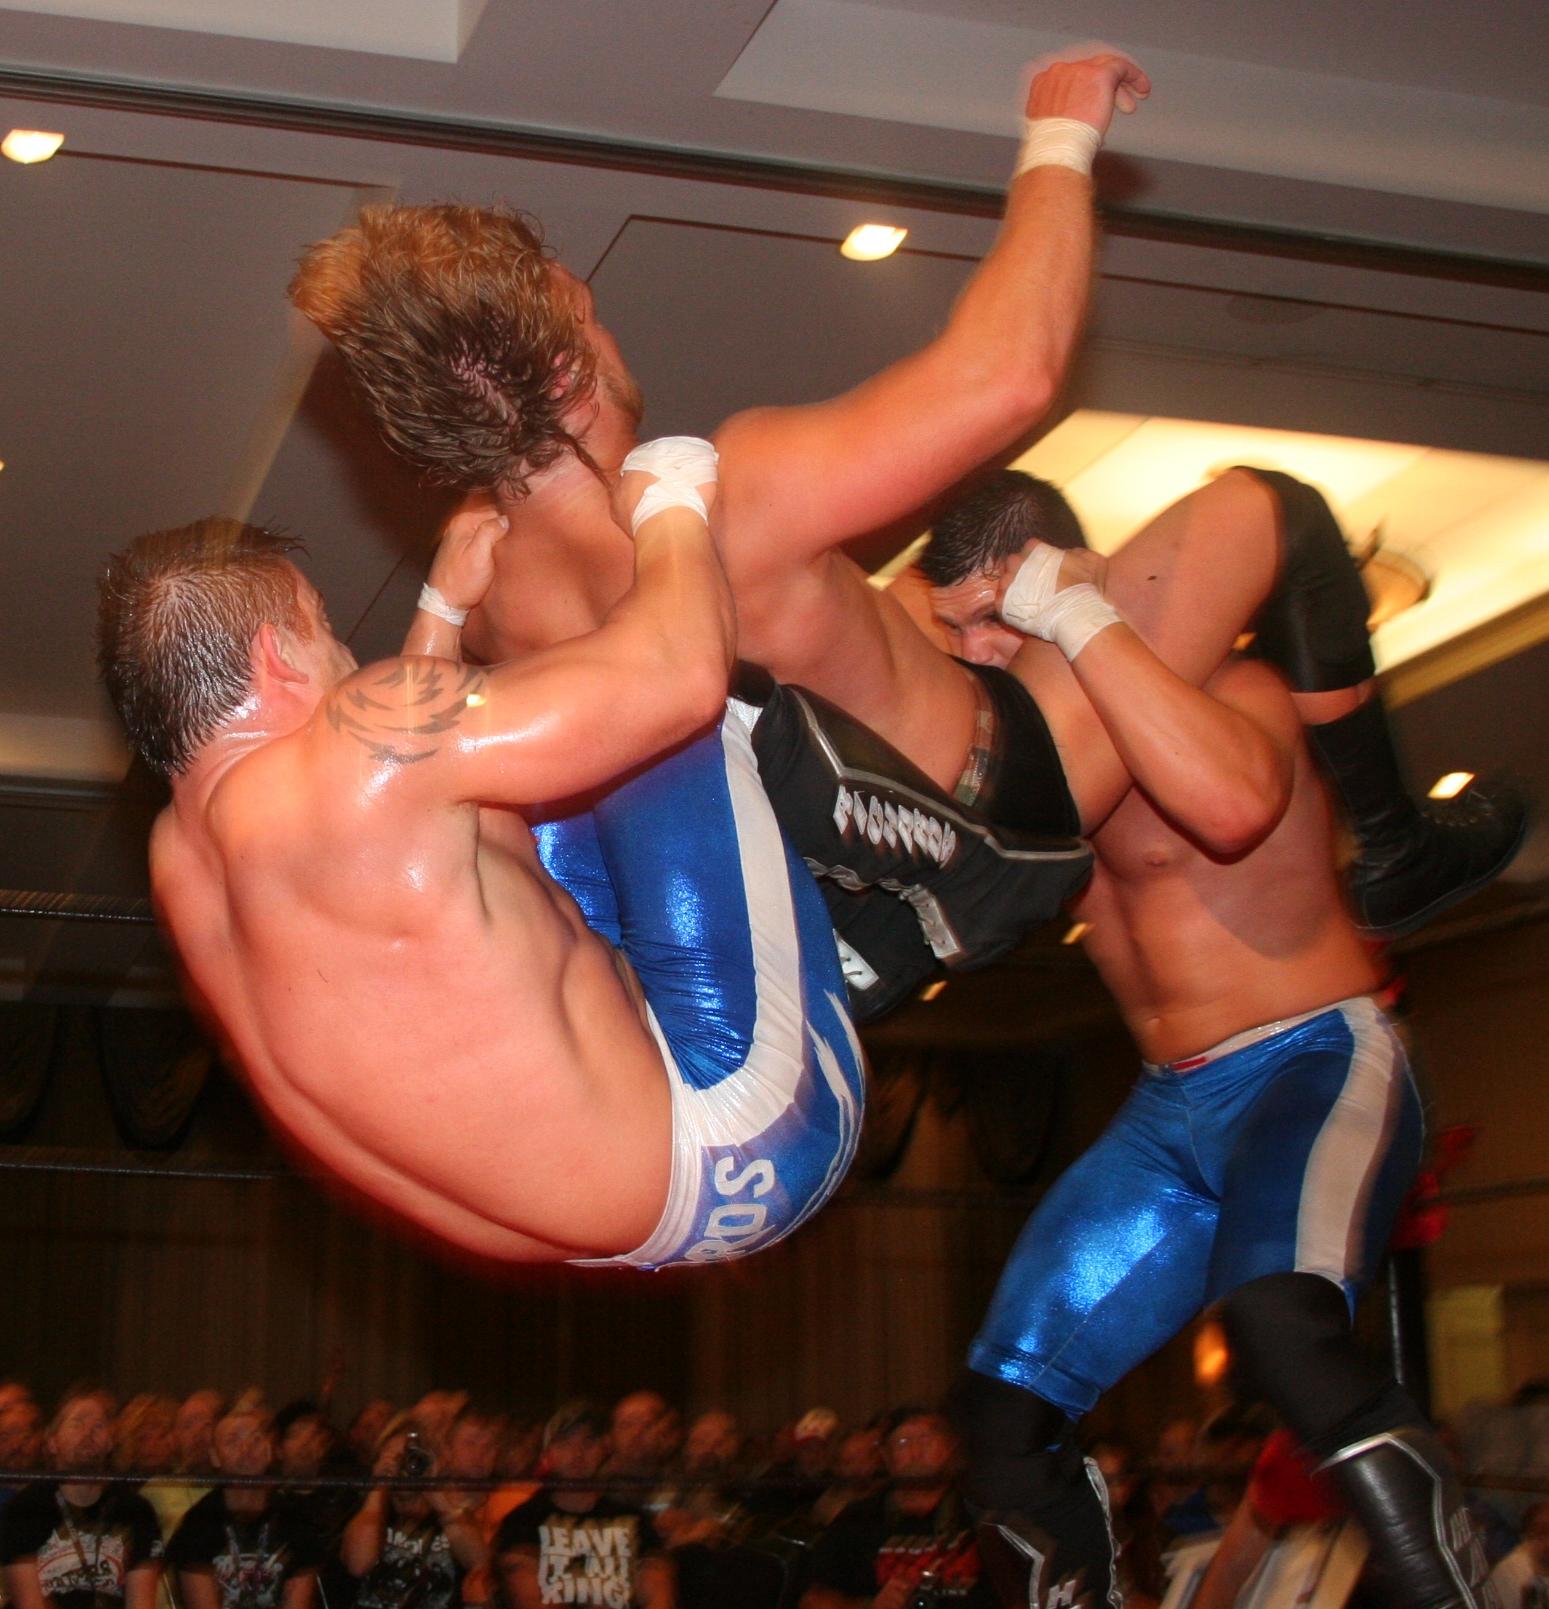 Sexy wrestling backbreaker